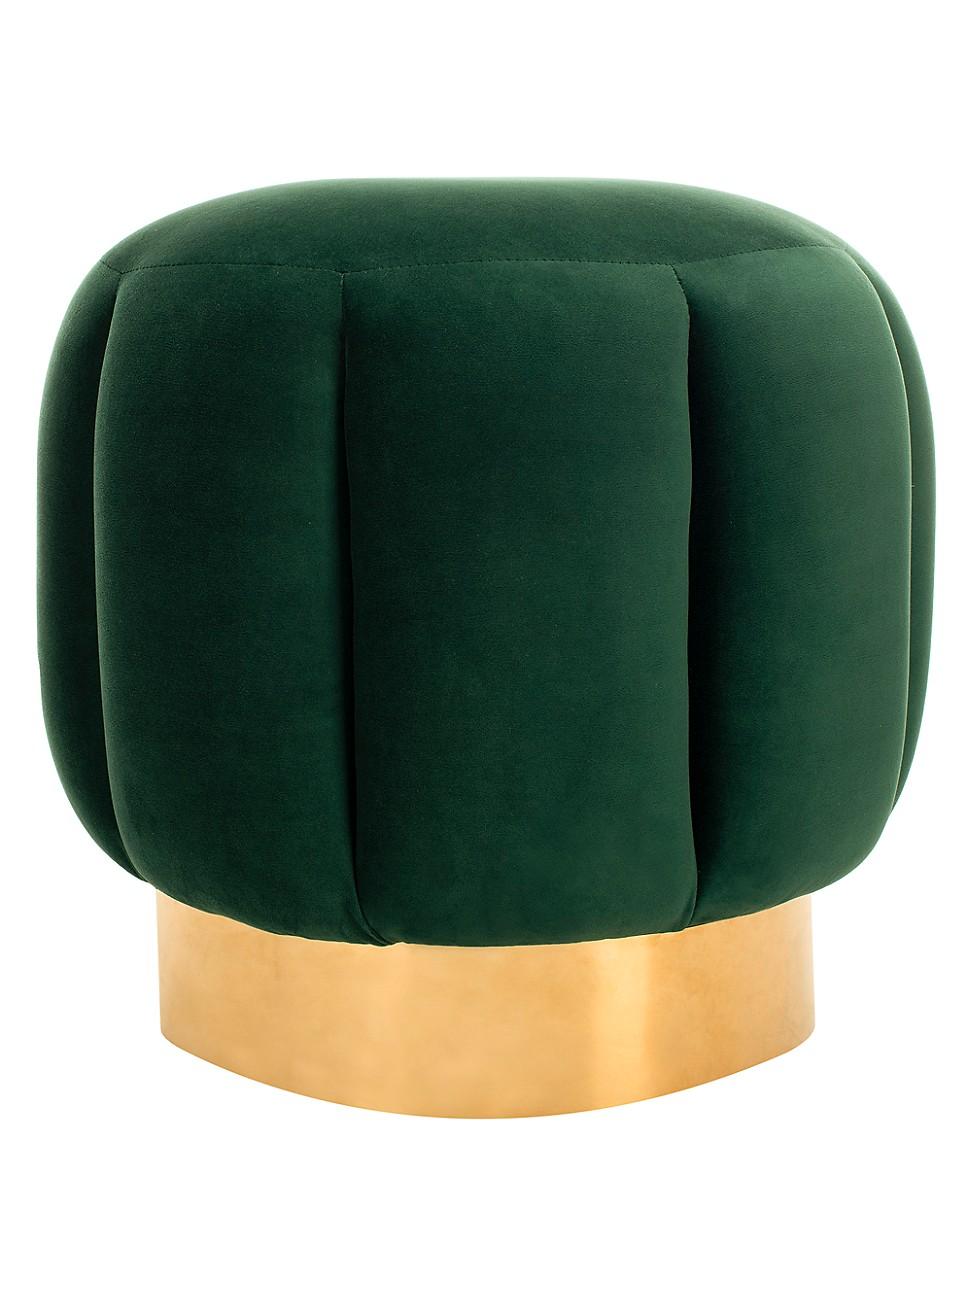 Safavieh Maxine Channel Tufted Ottoman In Emerald